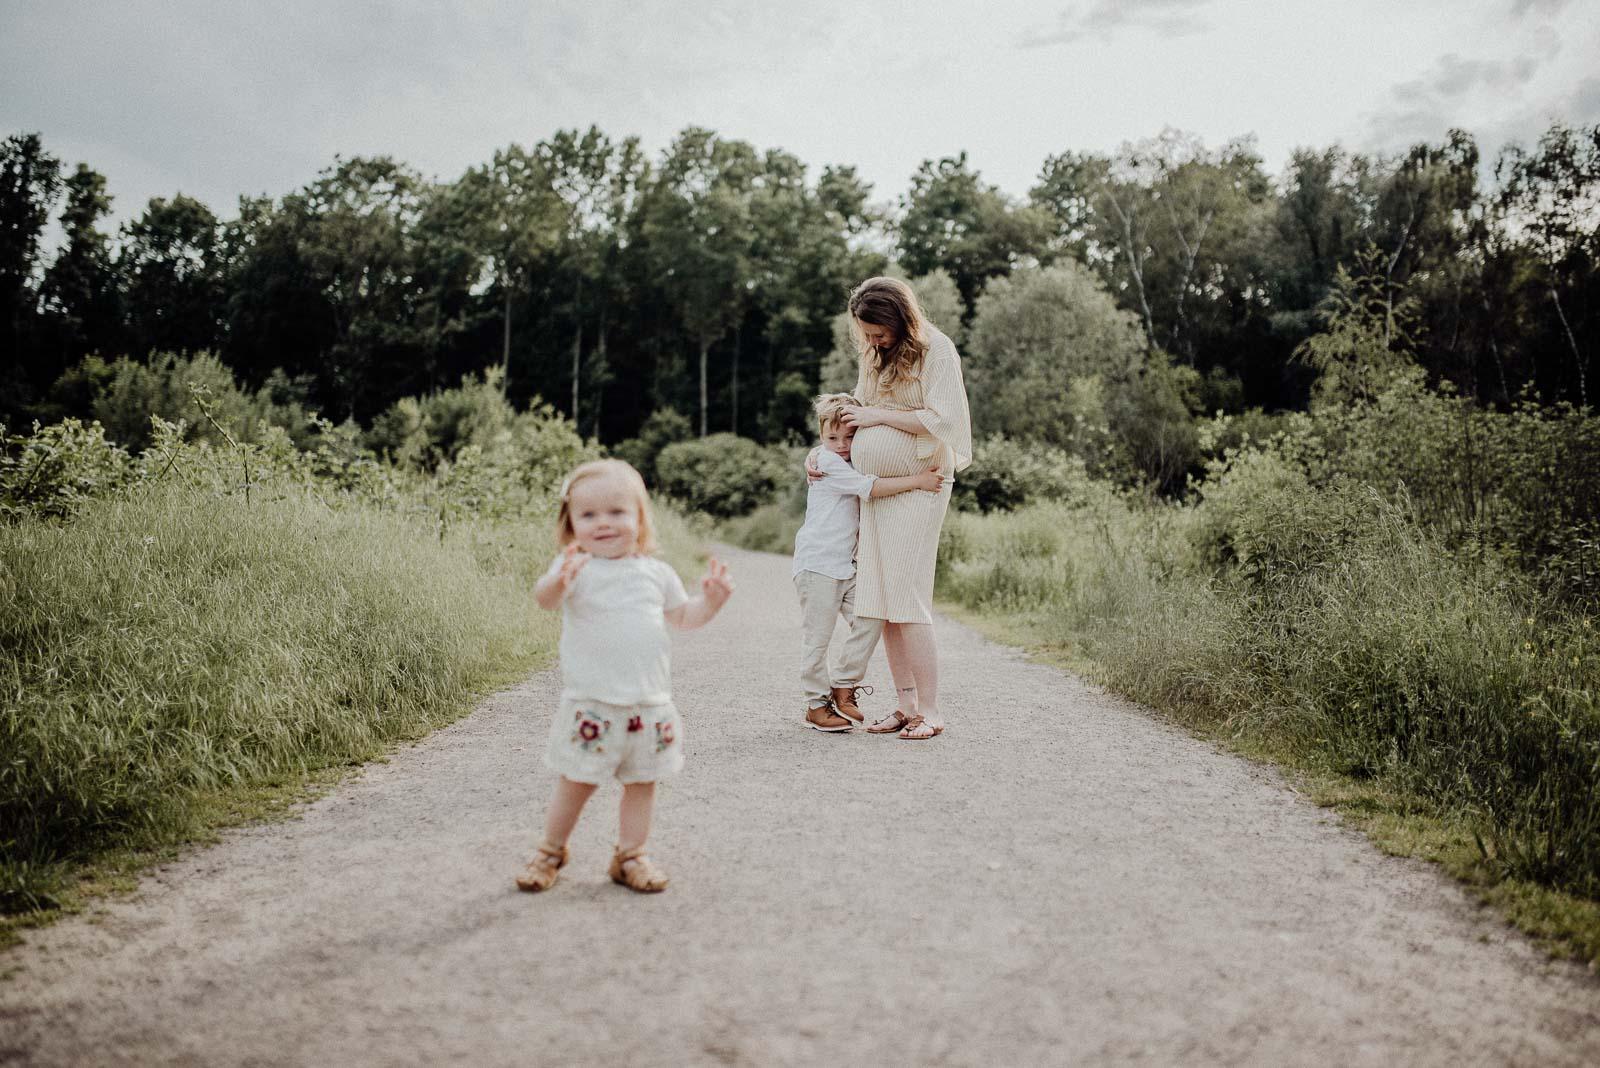 004-familien-fotoshooting-herne-heide